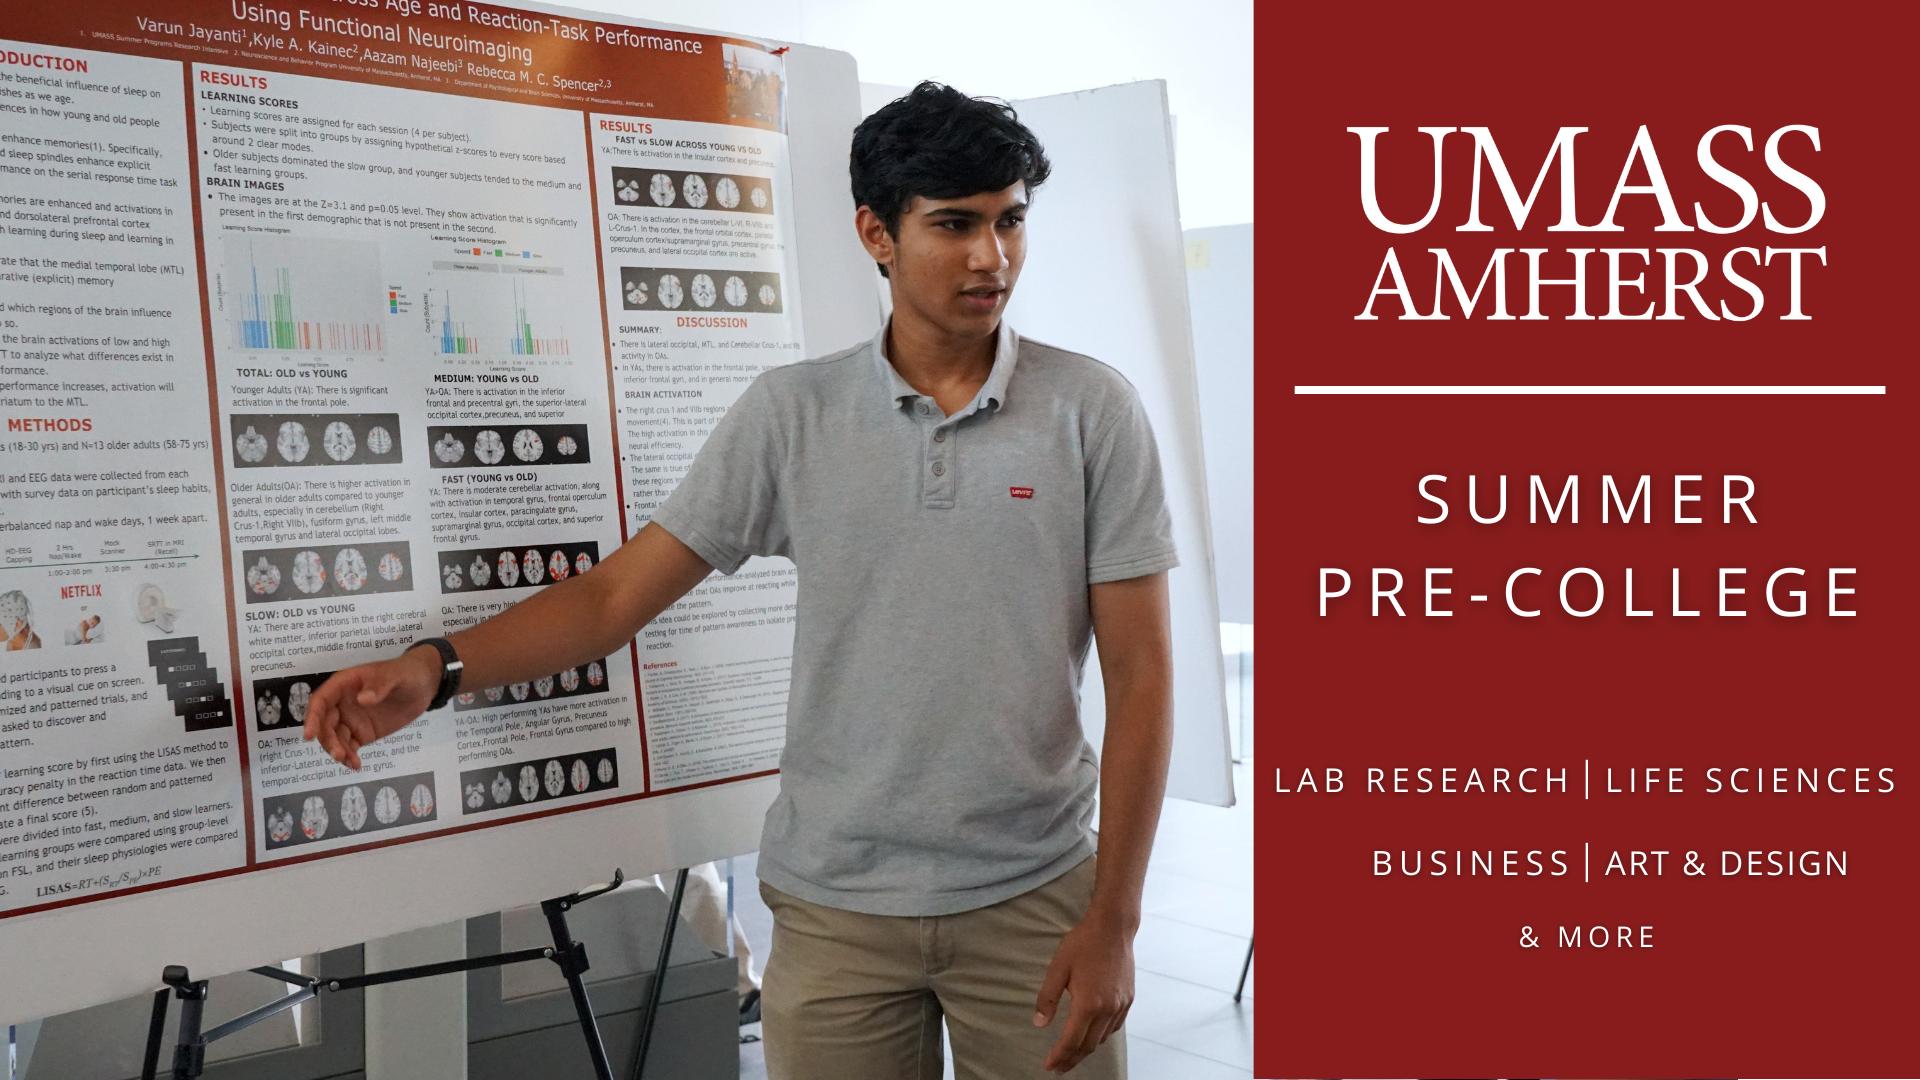 UMass Amherst Summer Pre-College: Sport Management & Leadership Academy